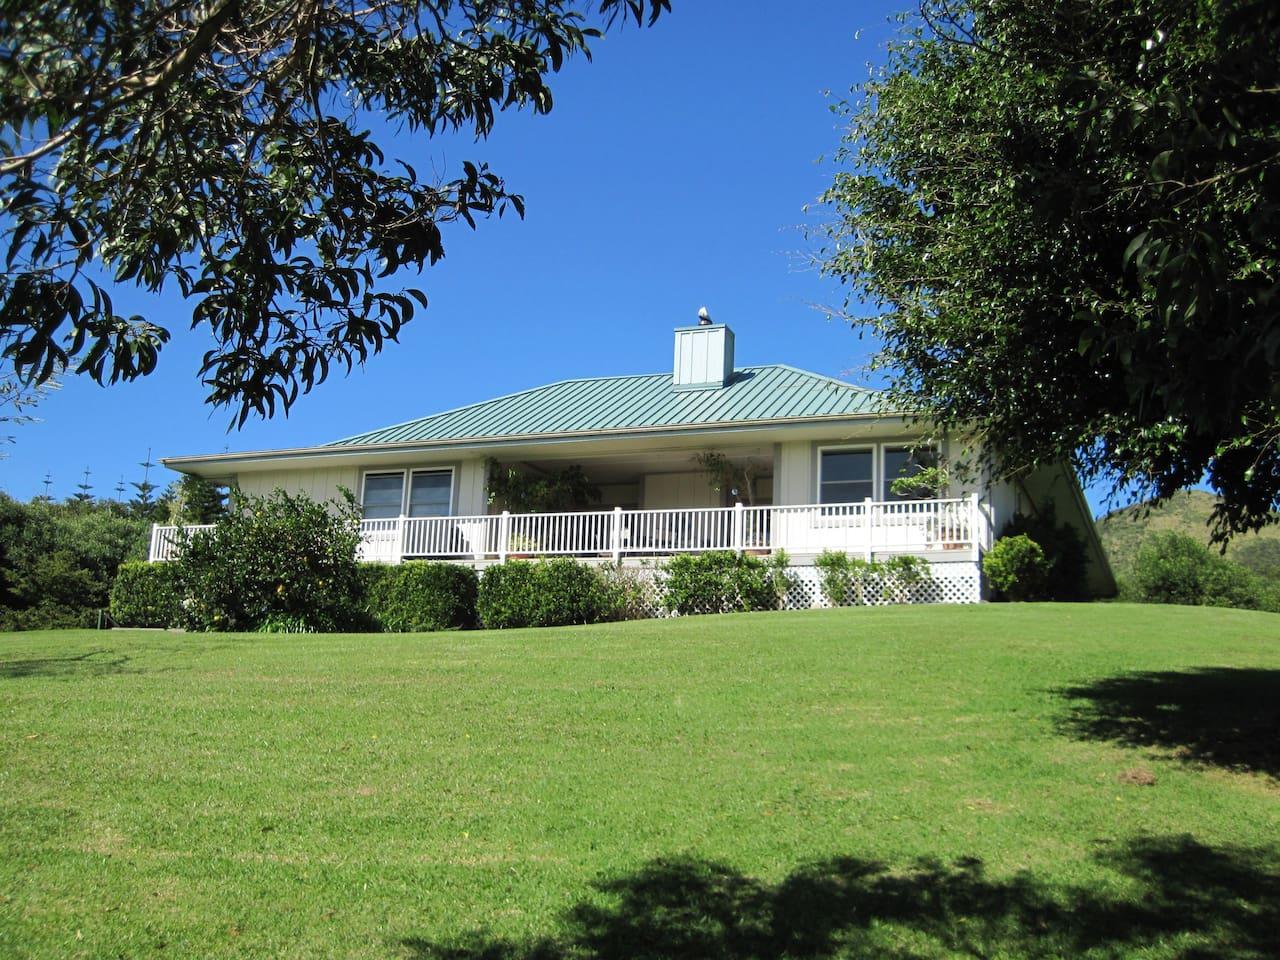 A beautiful Waimea home with spectacular Mauna Kea views from the large lanai.